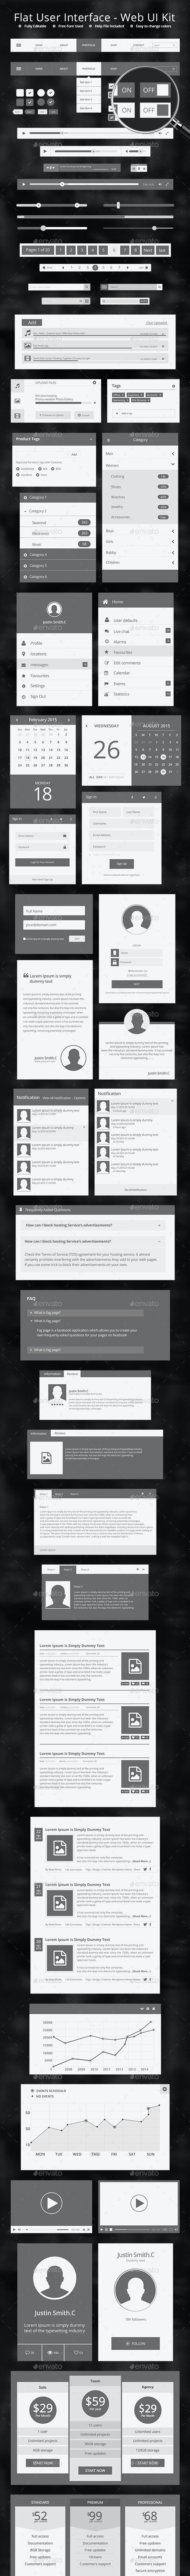 Flat User Interface - Web UI Kit - UPDATED - User Interfaces Web Elements